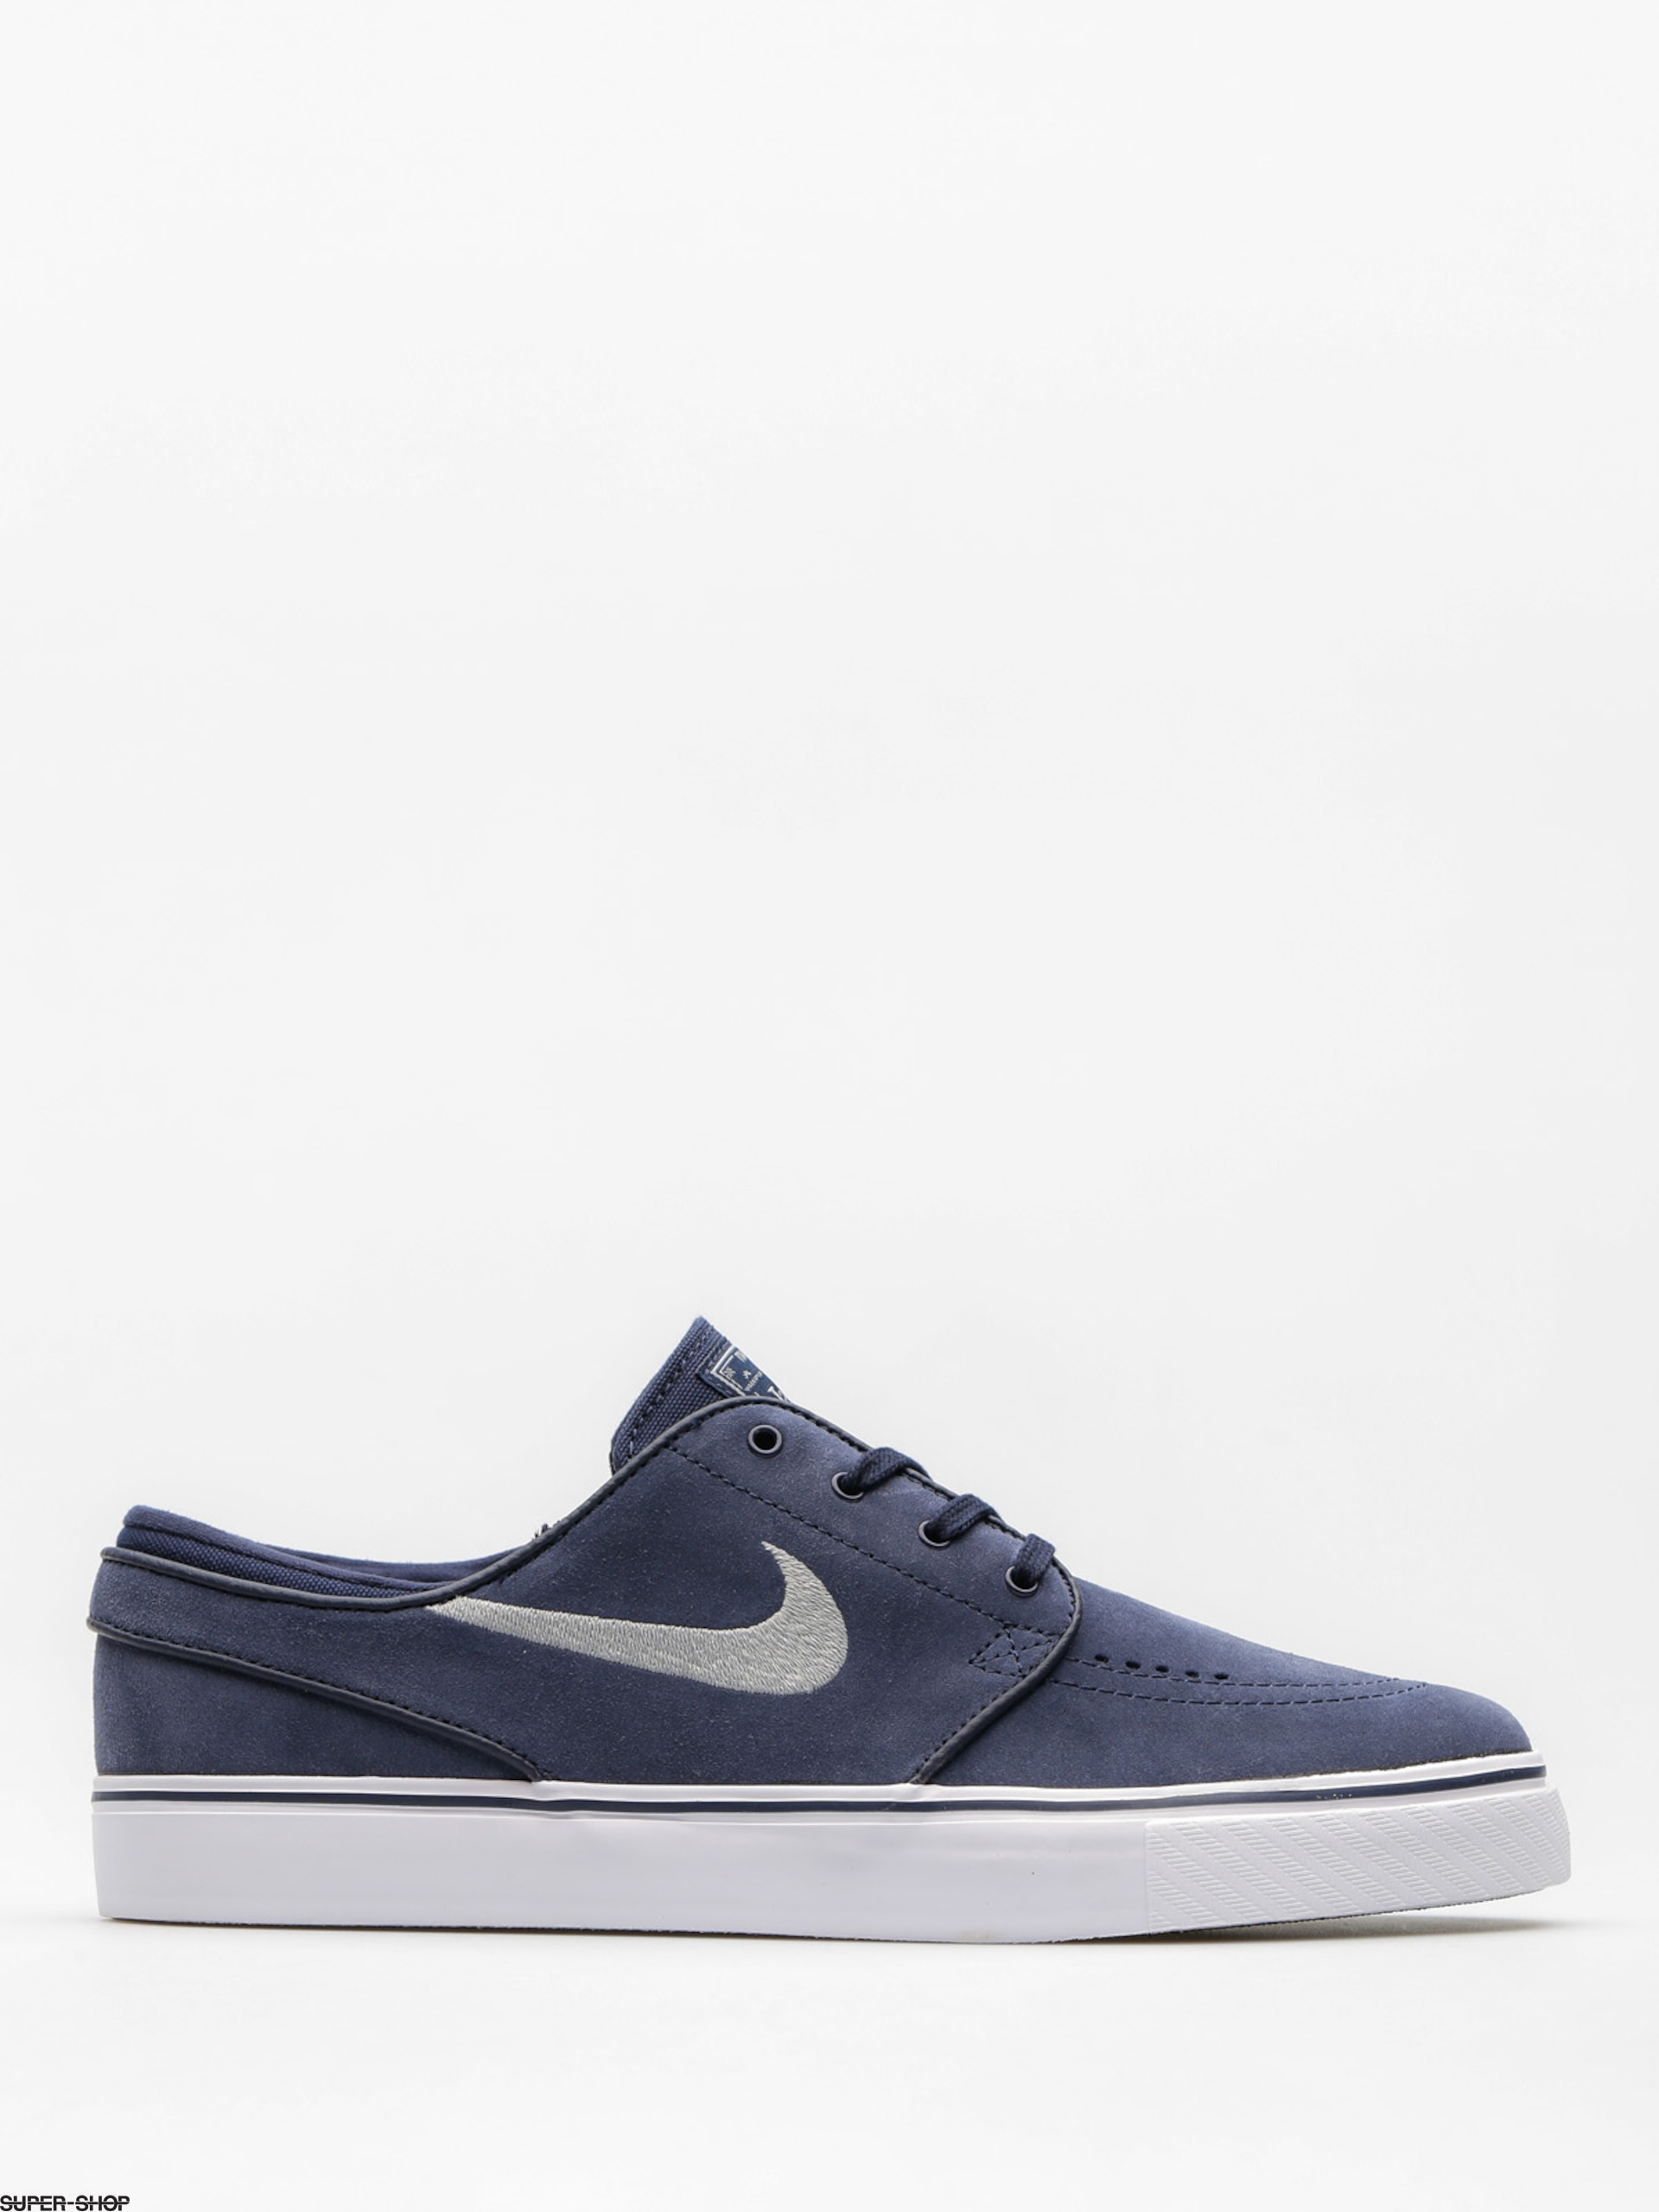 Nike SB Shoes Zoom Stefan Janoski (obsidianwolf grey black white)